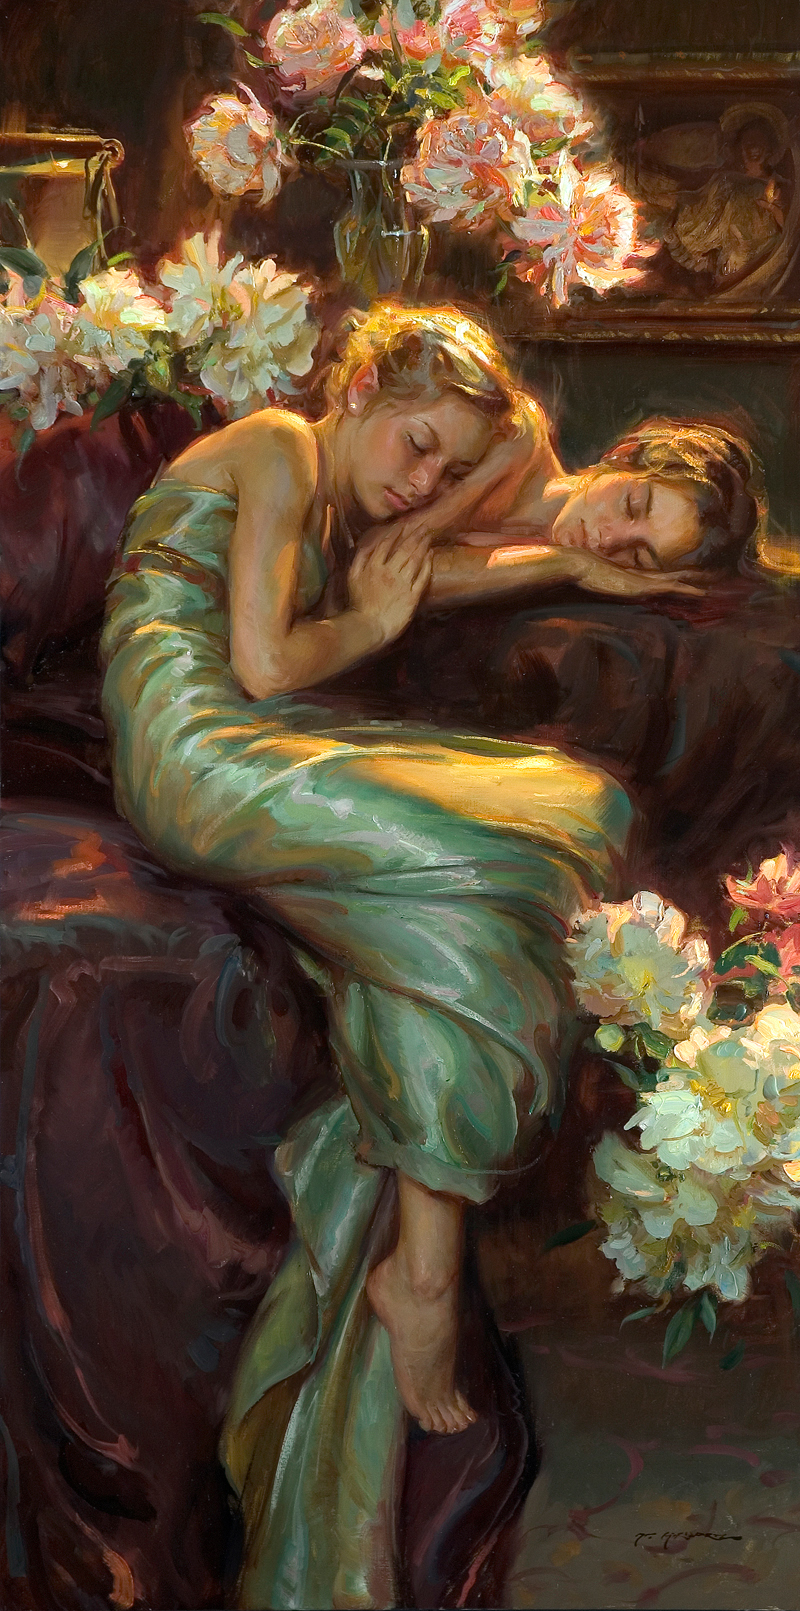 356-Daniel-Gerhartz_Midsummer's-Night_72x36_oil-on-canvas_nfs.jpg